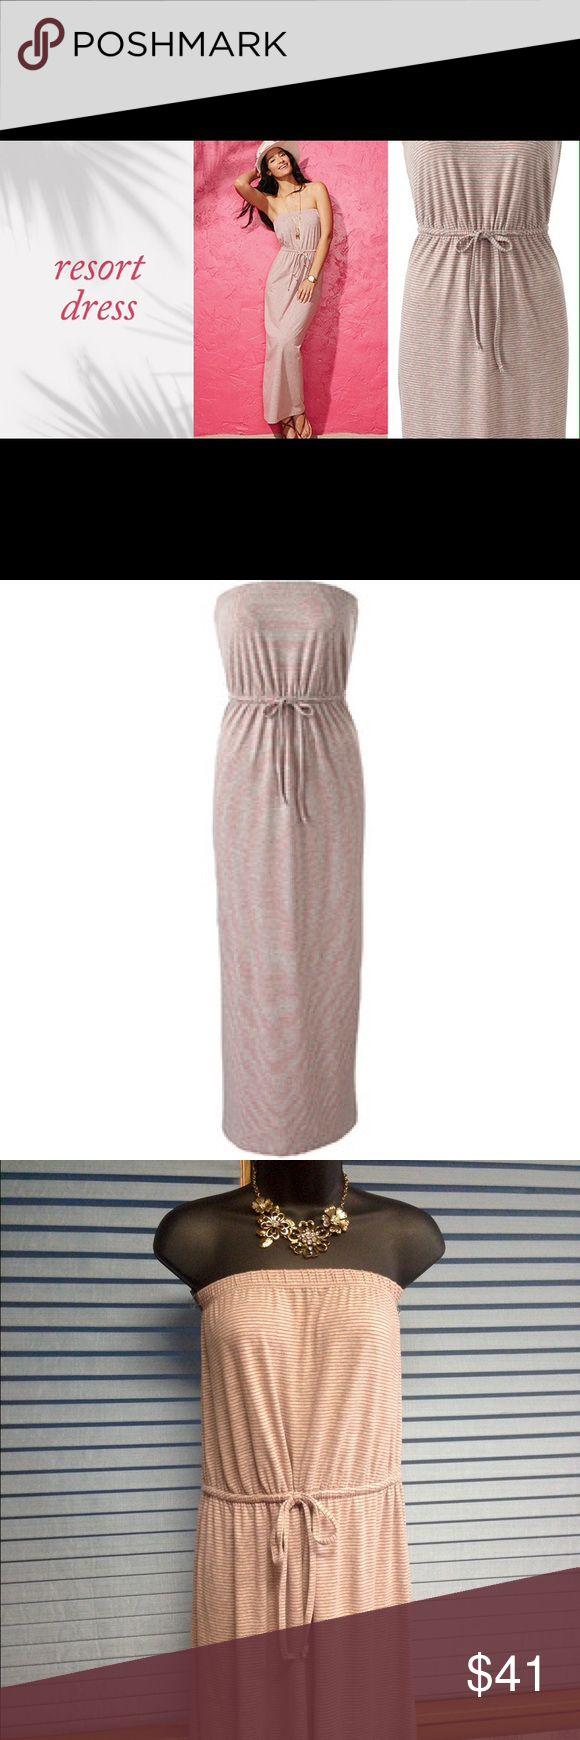 Cabi Resort Dress (XL) Cabi Resort Dress (XL). NWOT. Never worn! CAbi Dresses Maxi